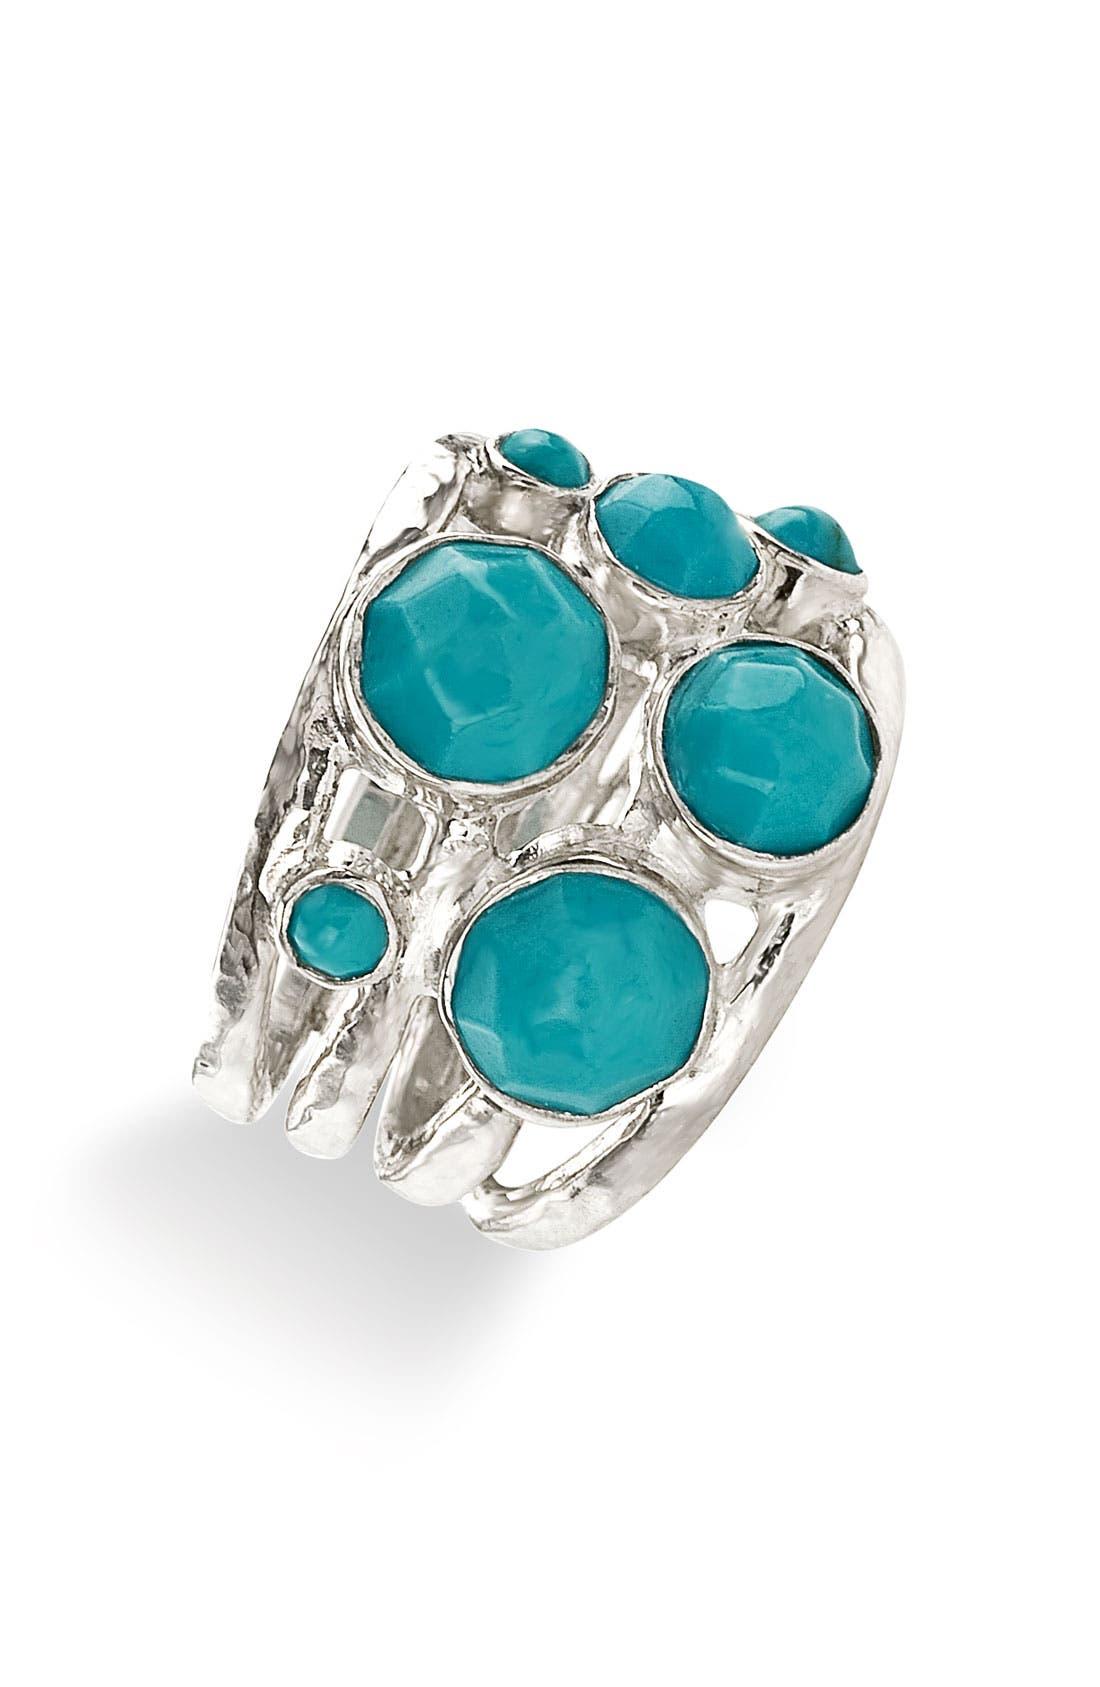 Main Image - Ippolita 'Rock Candy - Constellation' Semiprecious Ring